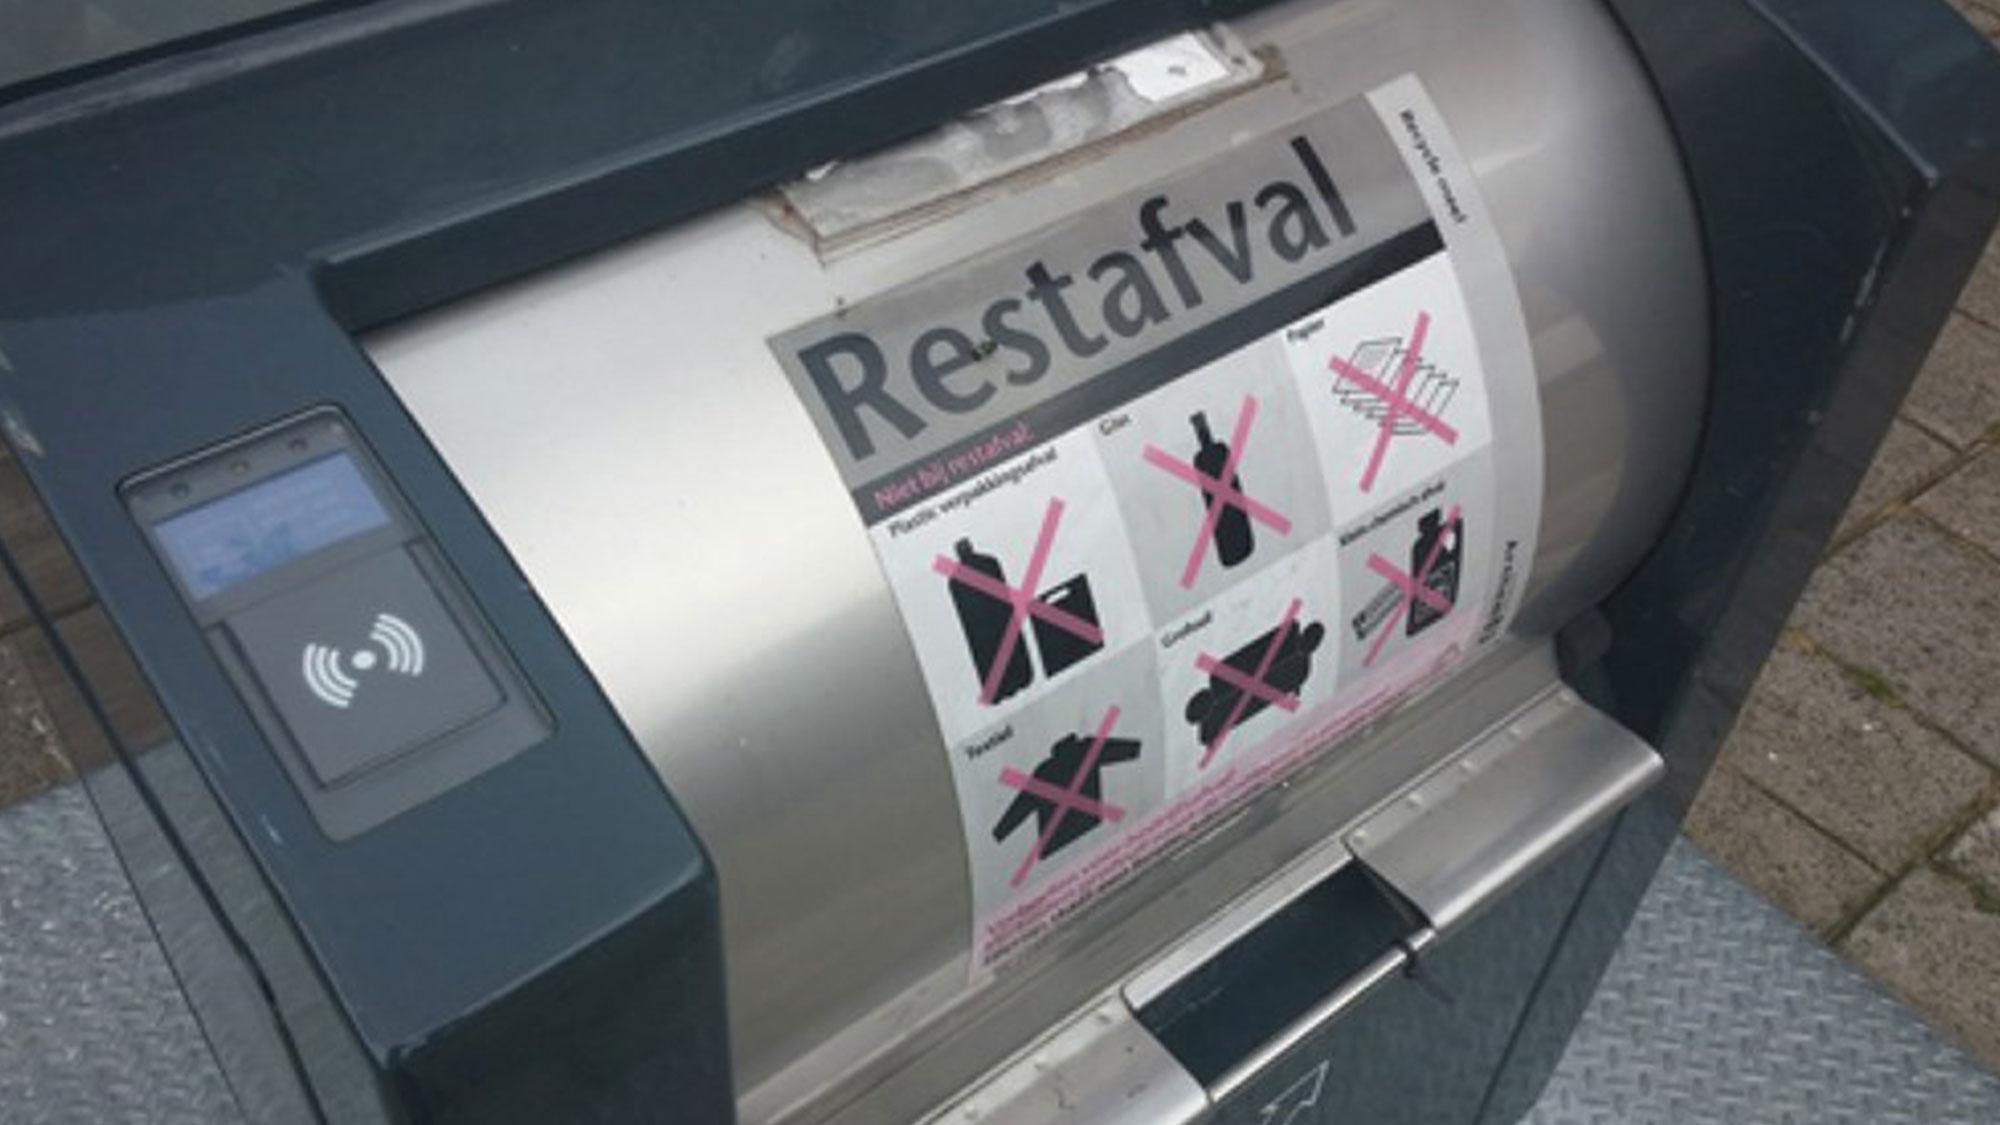 Arnhem反转废物收集